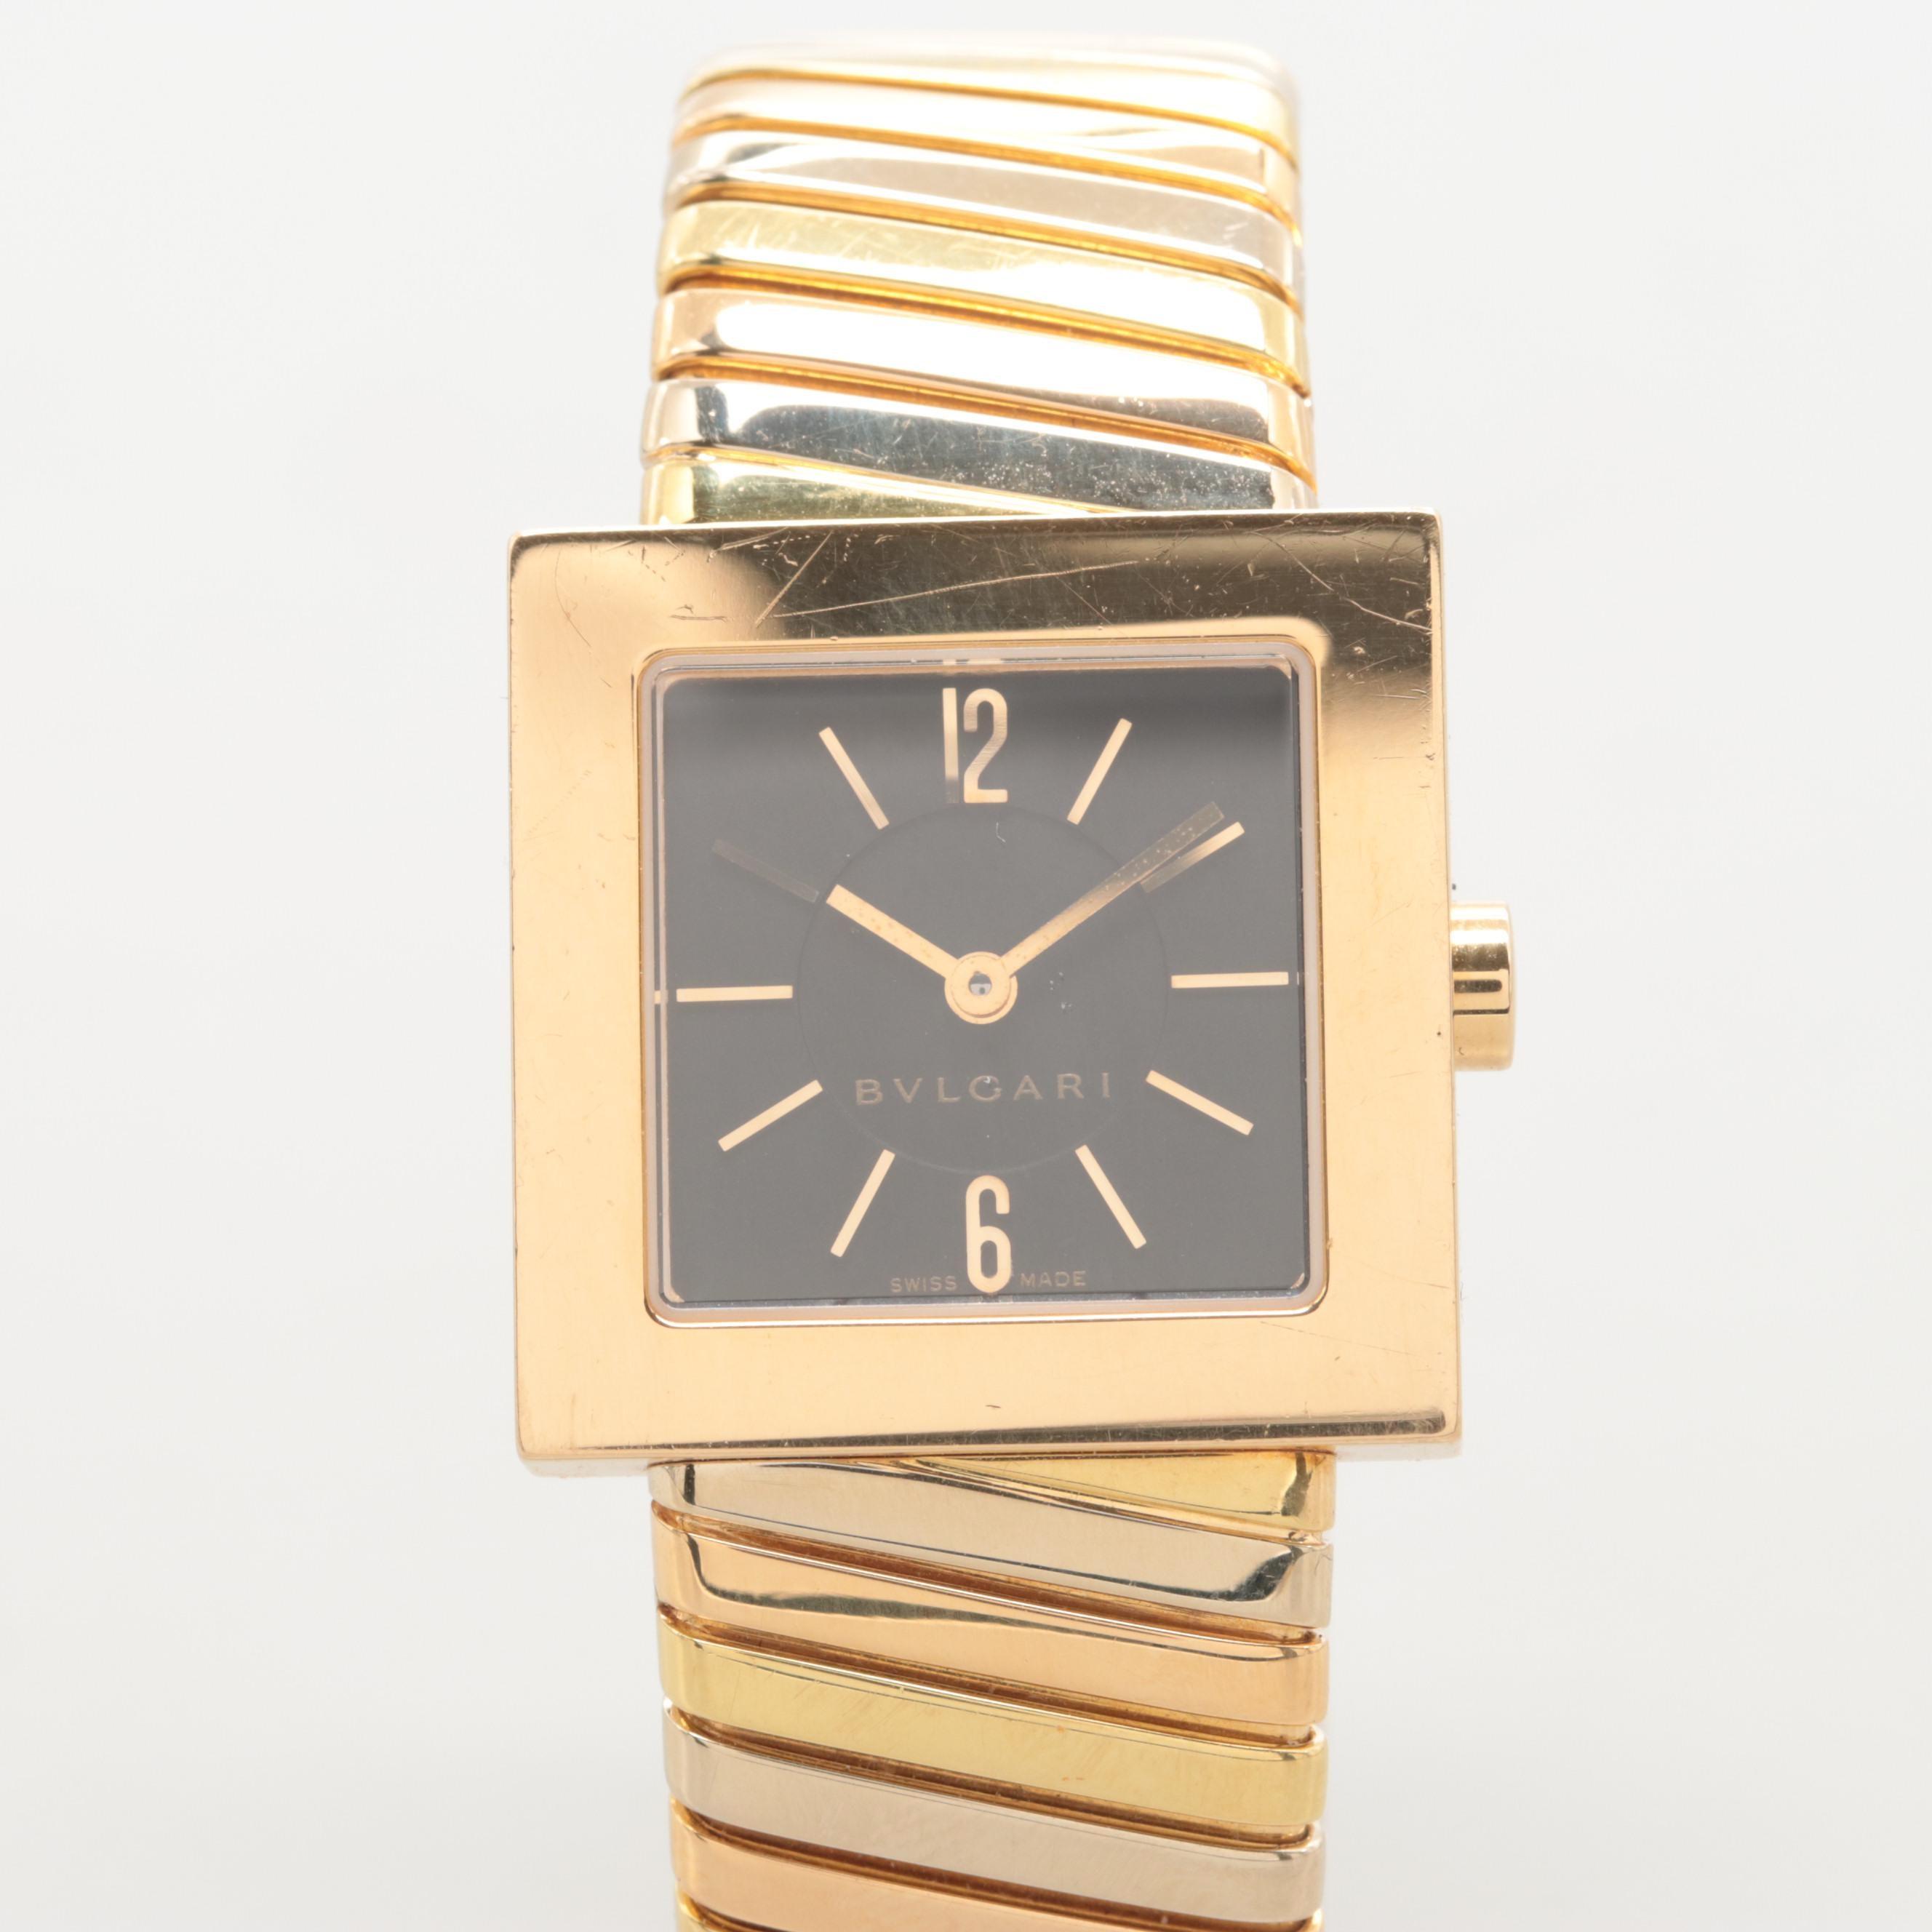 Bulgari Tubogas 18K Gold Quartz Wristwatch With Tri-Color Gold Band